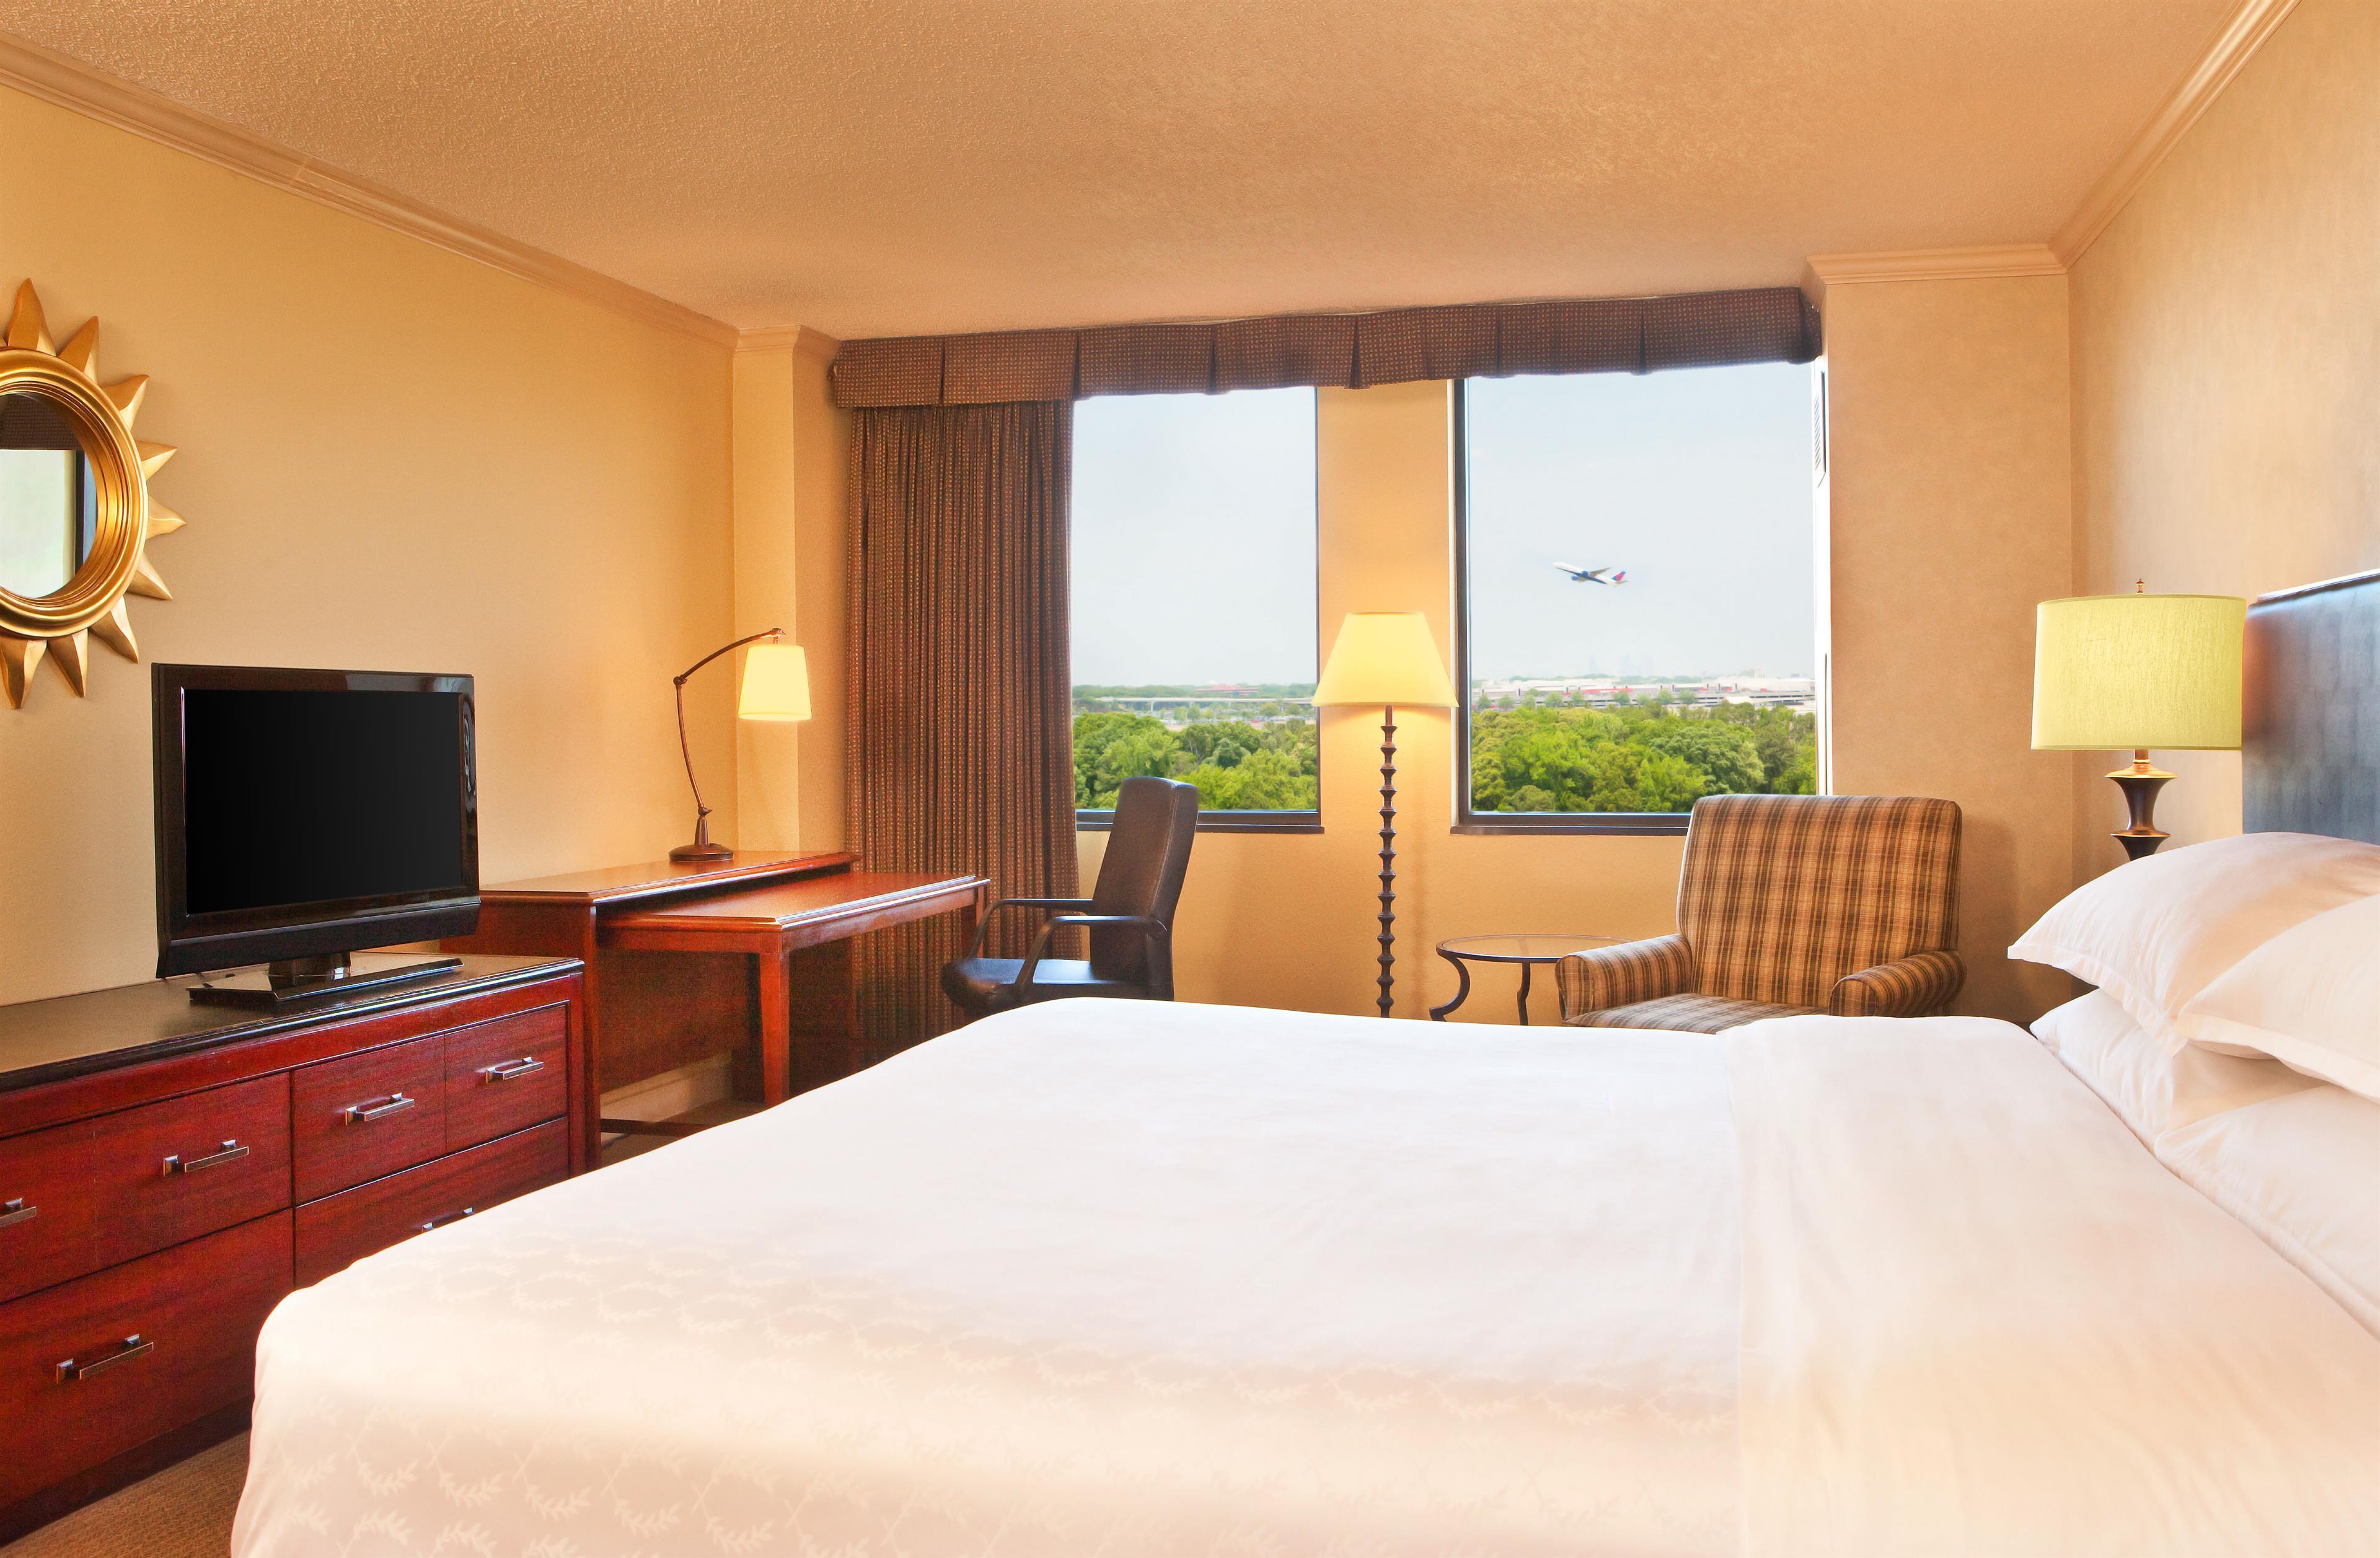 Sheraton Atlanta Airport Hotel image 3